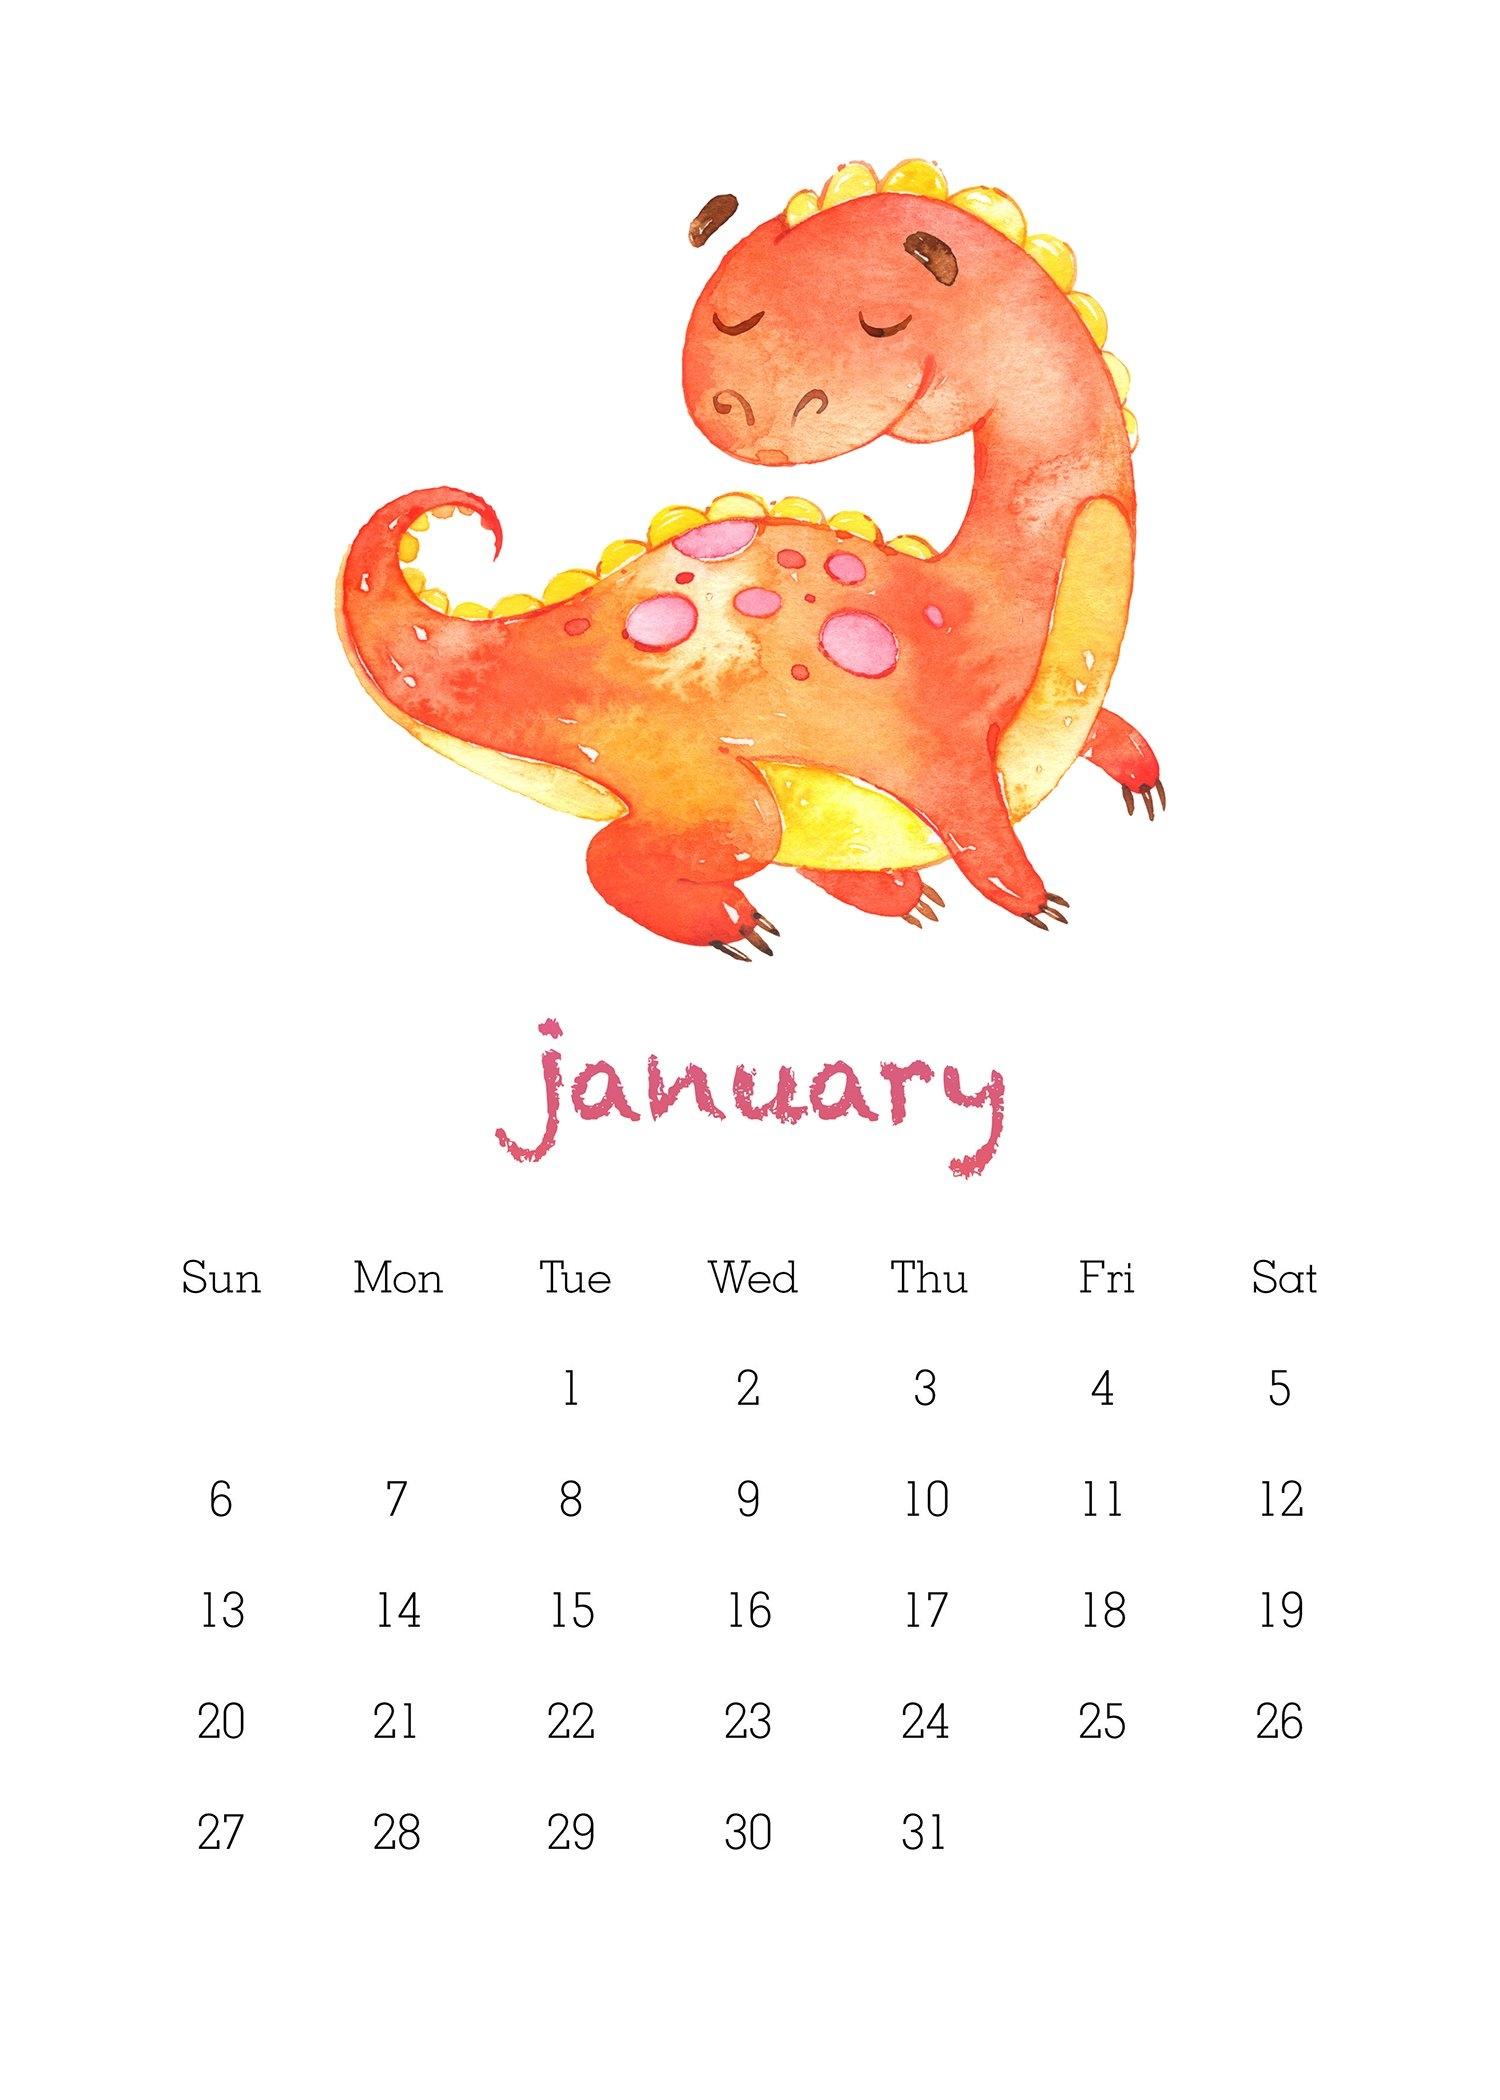 Free Printable 2019 Watercolor Dinosaur Calendar - The Cottage Market Calendar 2019 Octopus